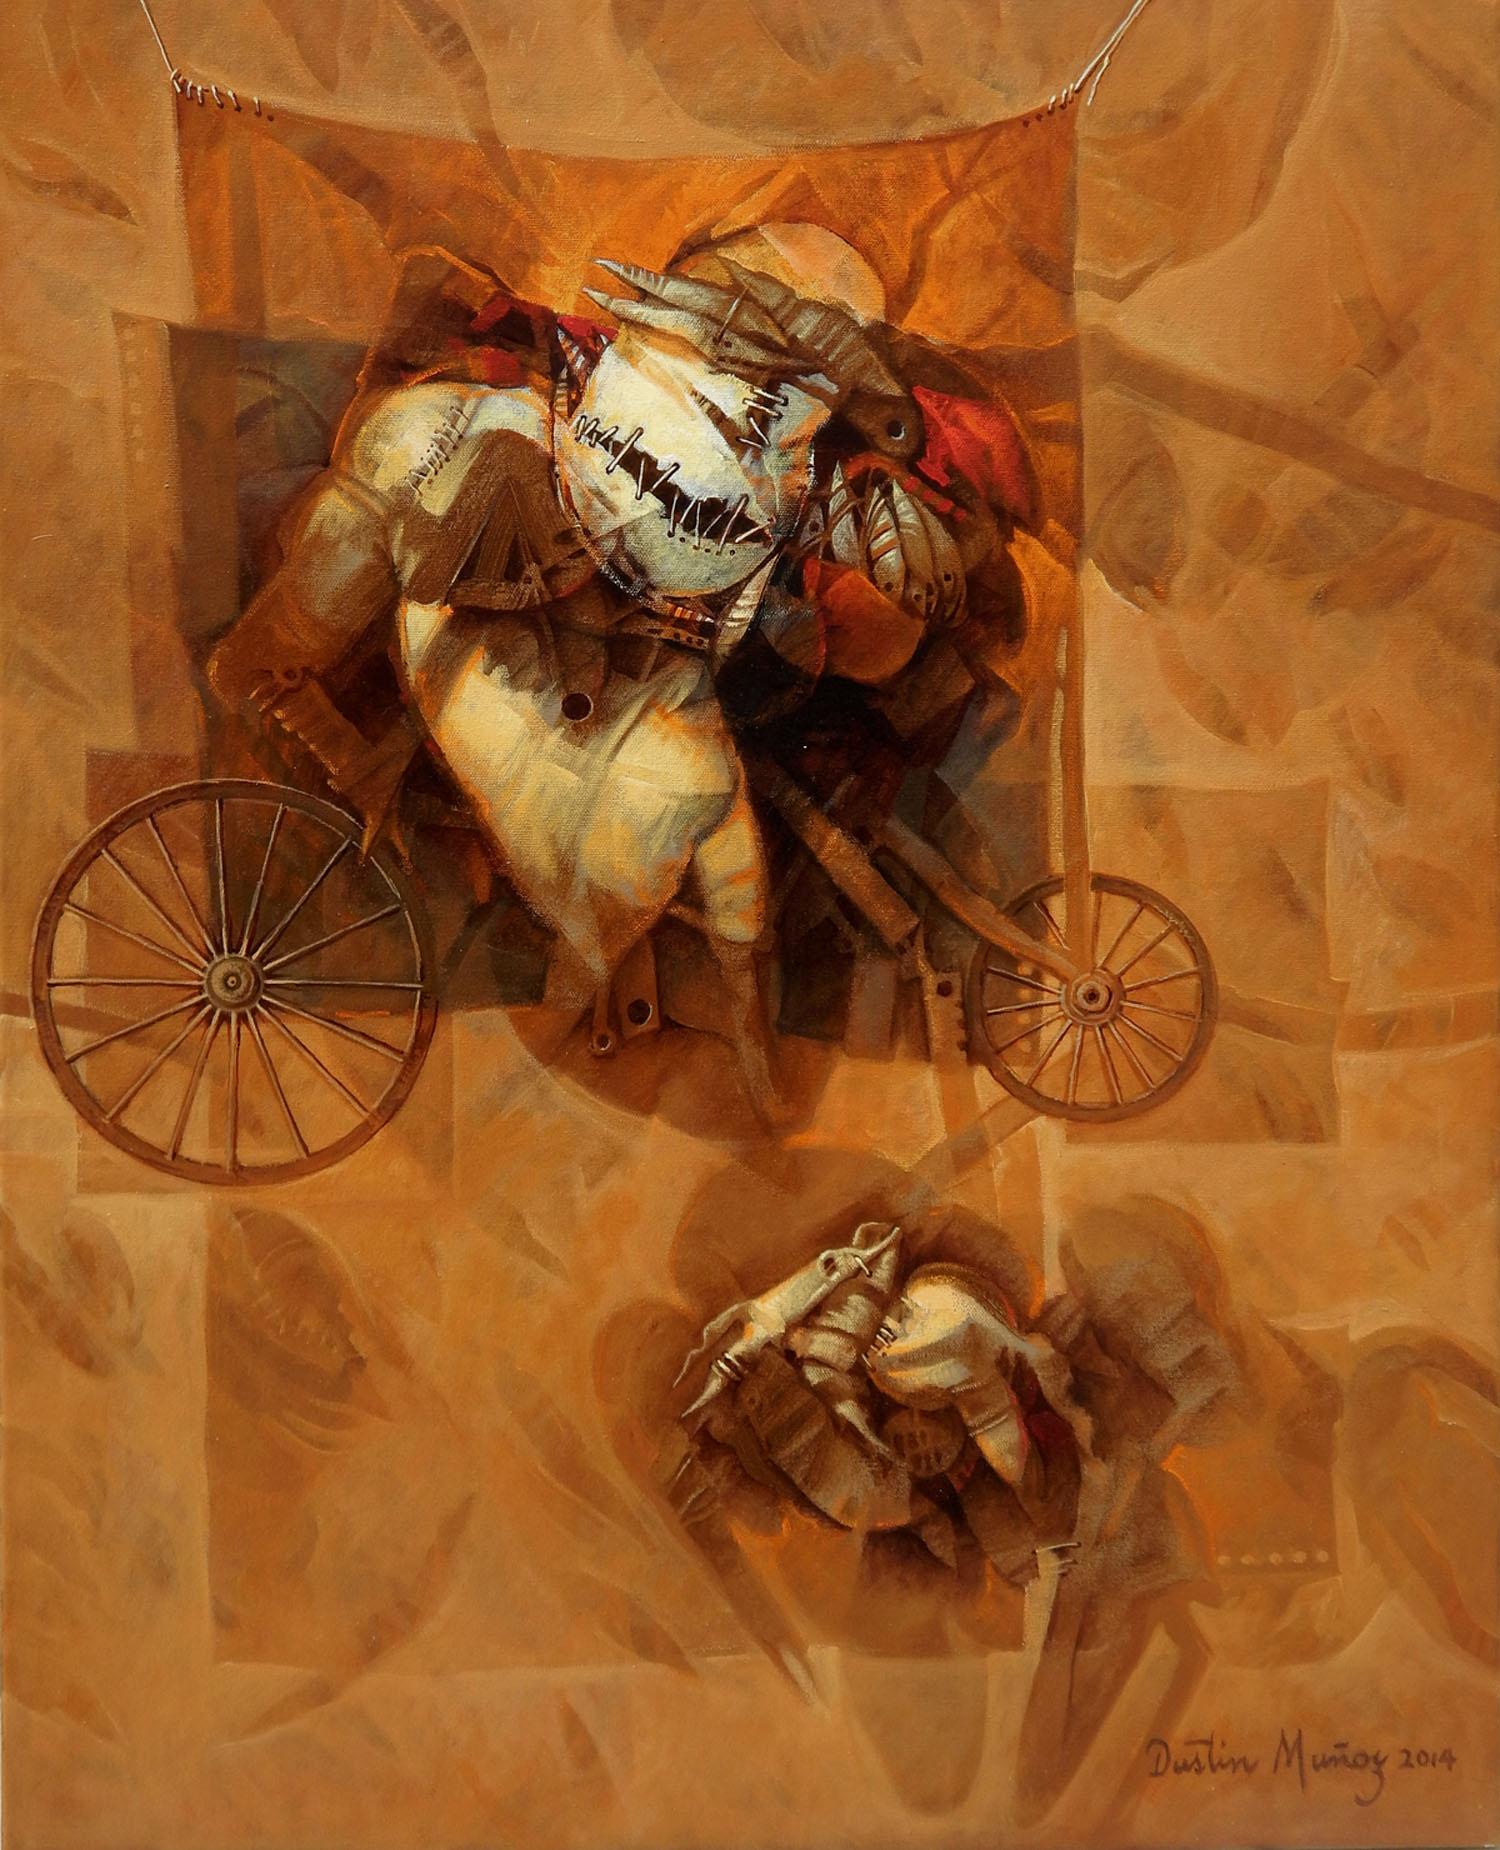 Detrás del telón, 30x24 pulgs, Dustin Muñoz, 2014